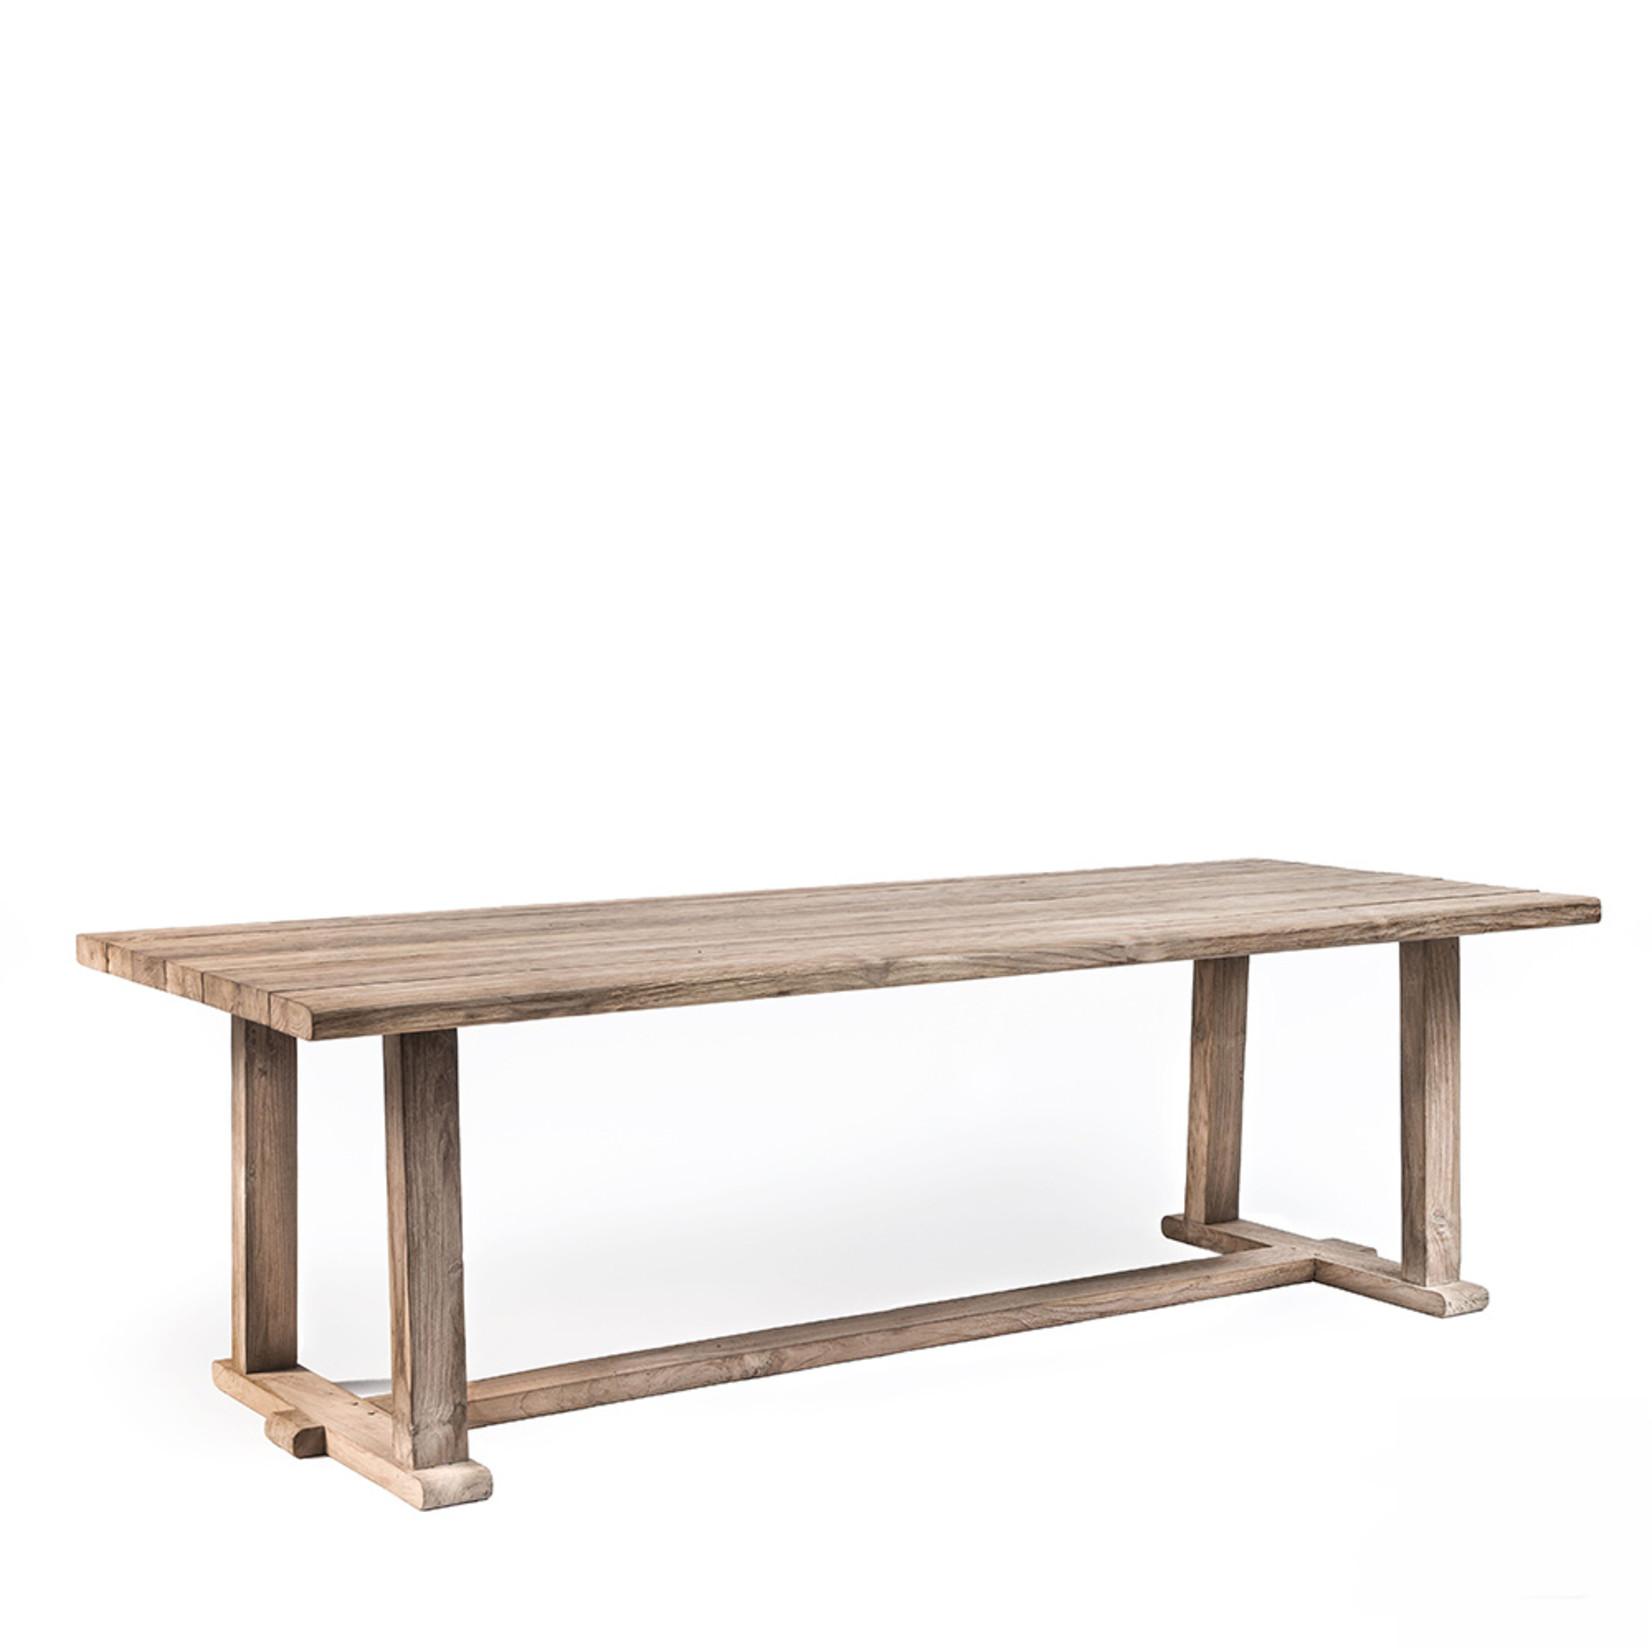 Gommaire Table Josse | Reclaimed Teak Natural Grey